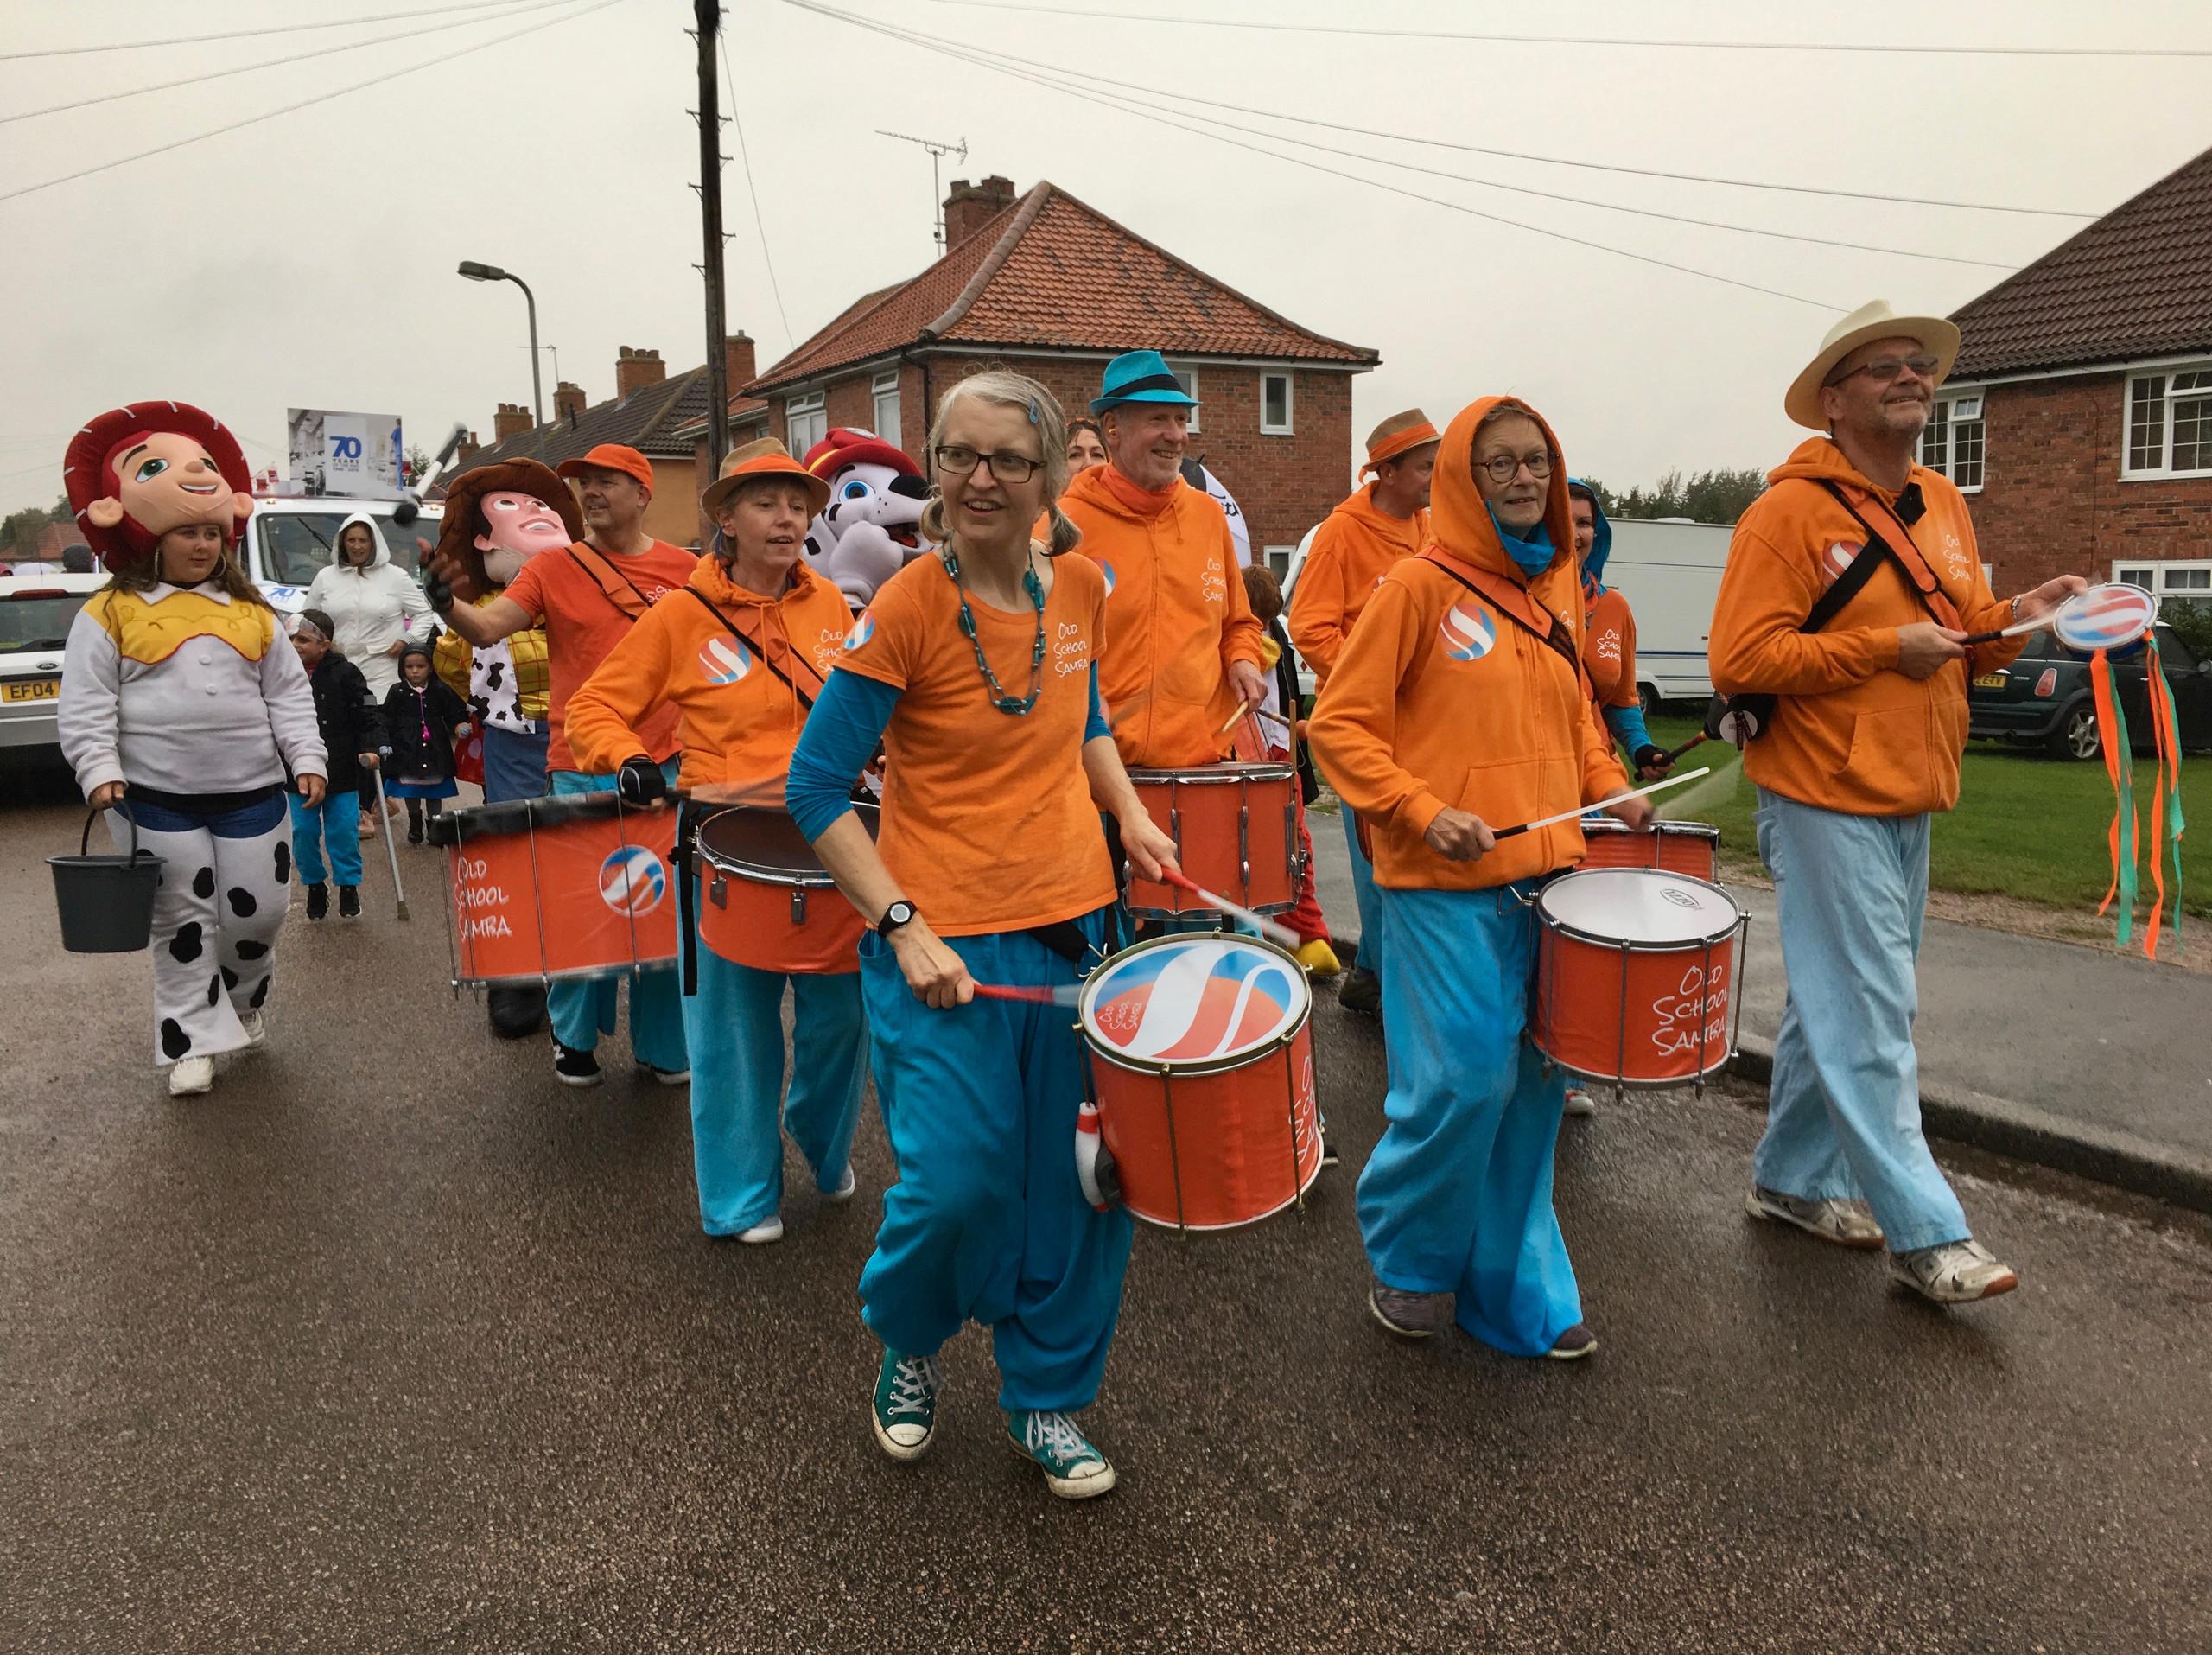 Old School Samba at Aylesham's Carnival Parade 2018